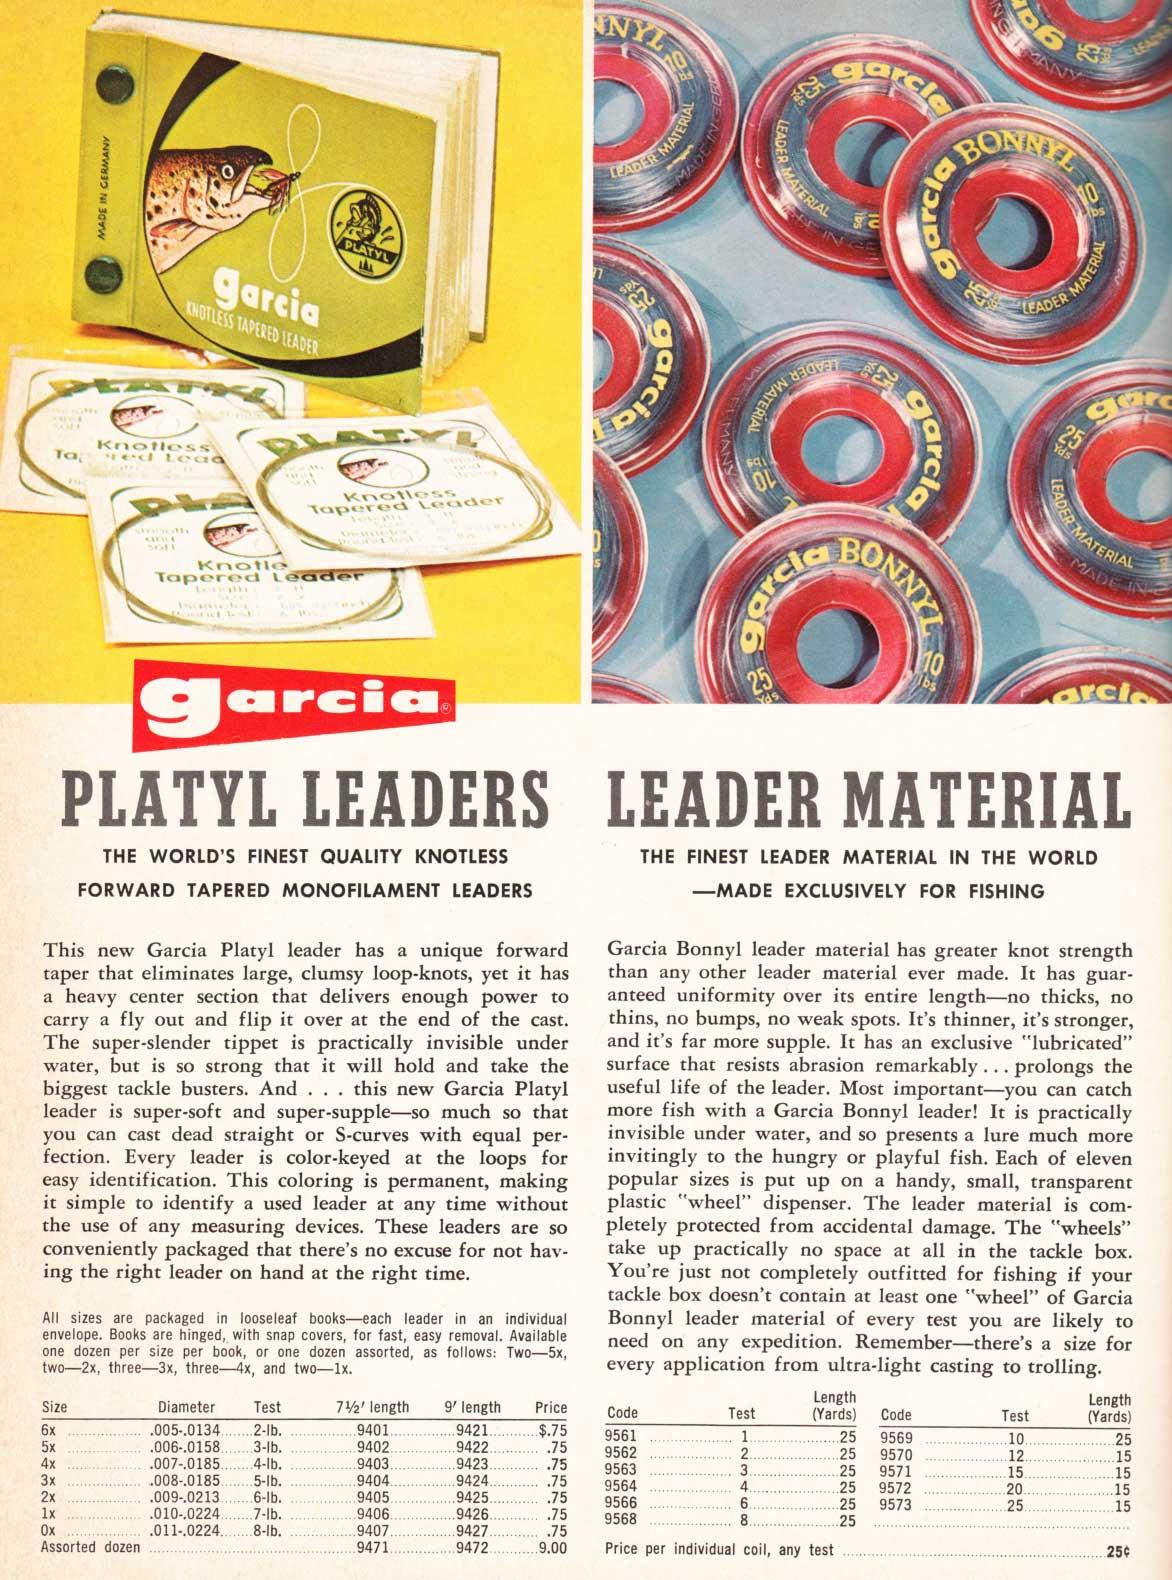 Garcia-Katalog von 1968. Bilder: John Fishkat